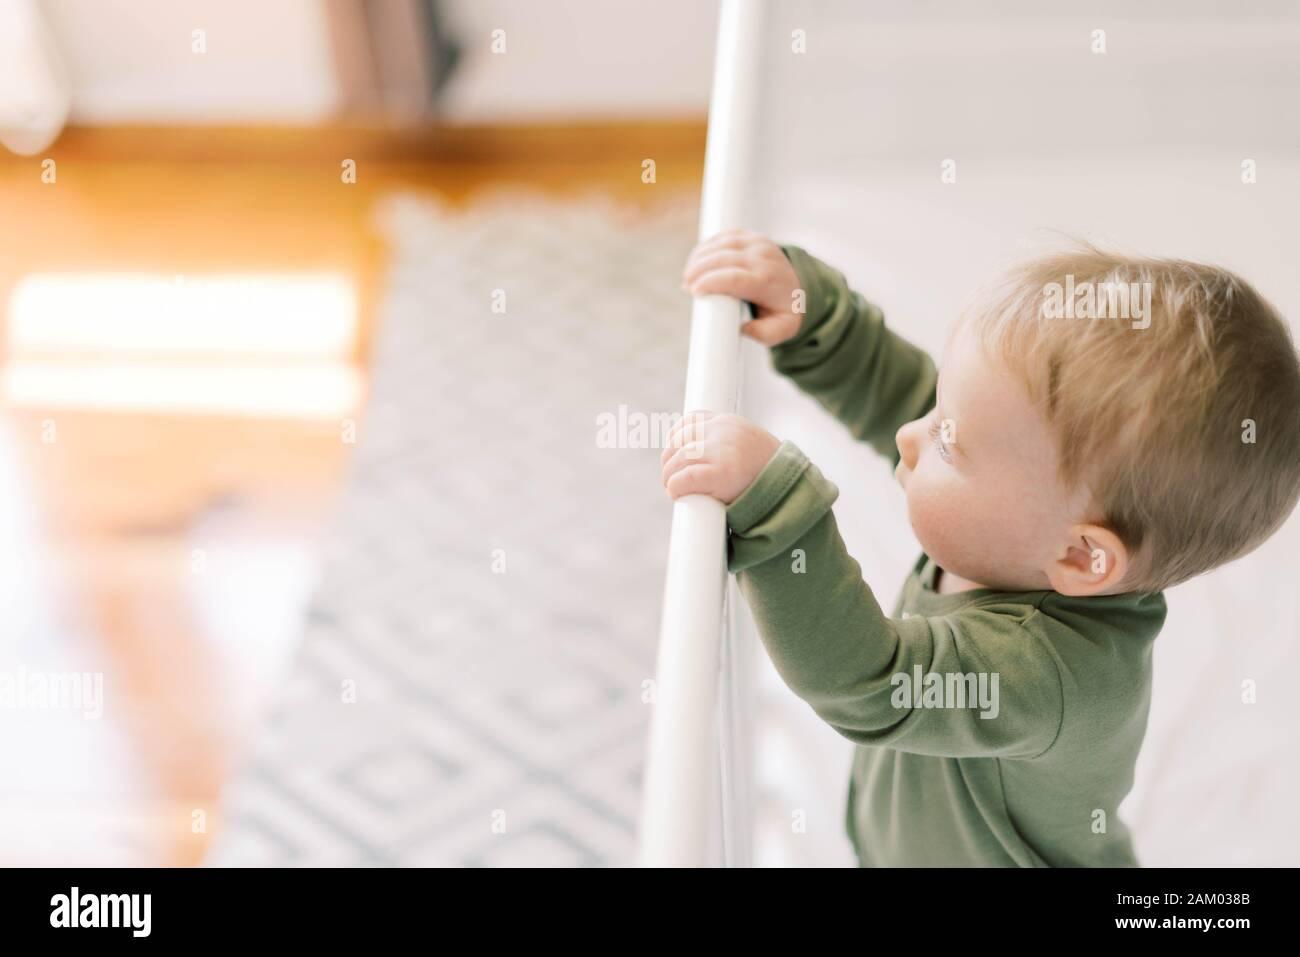 Little baby girl in her nursery. Stock Photo